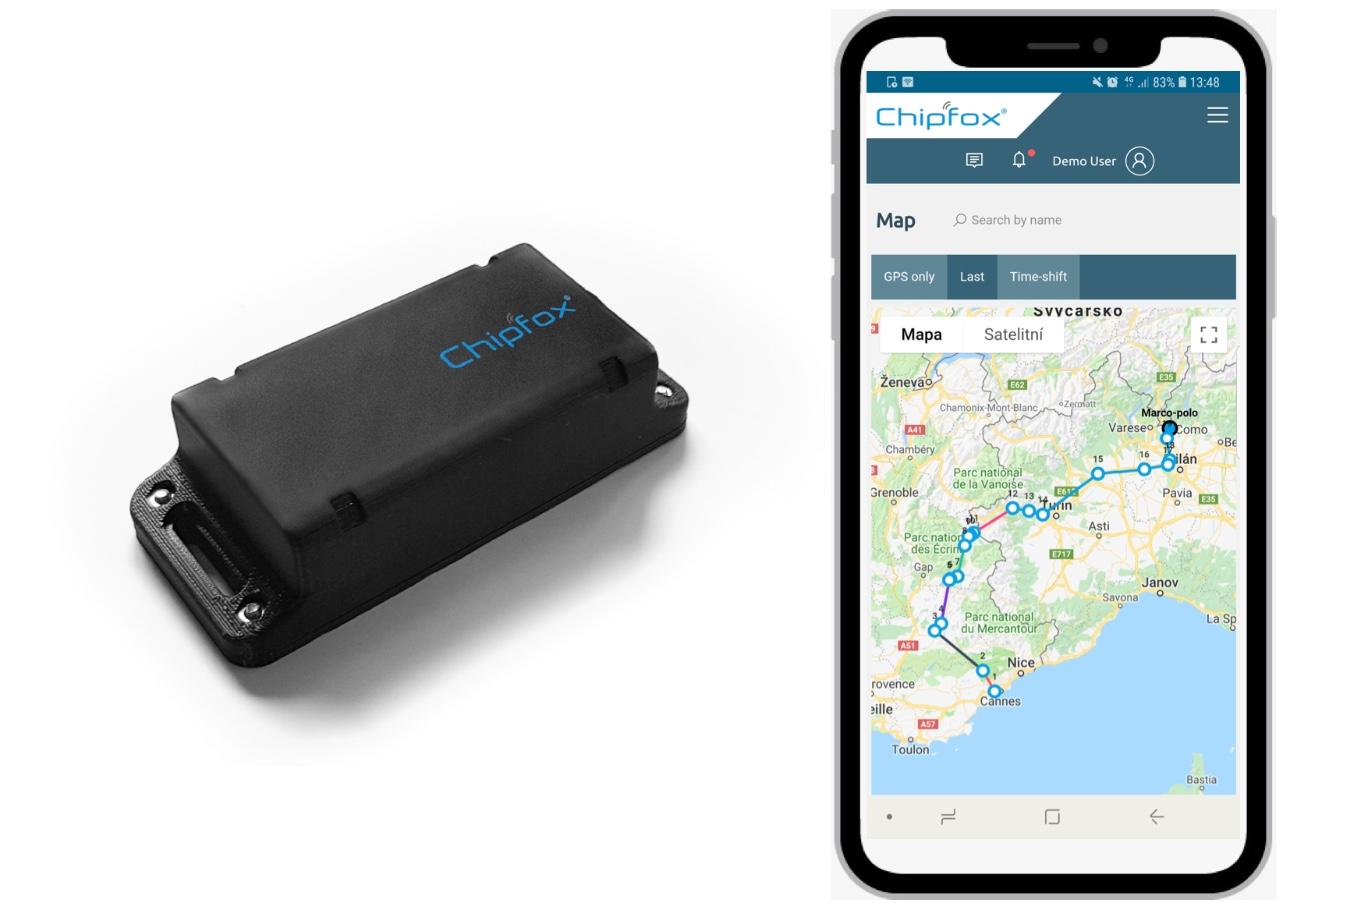 Chipfox GPS tracker | Sigfox Partner Network | The IoT solution book